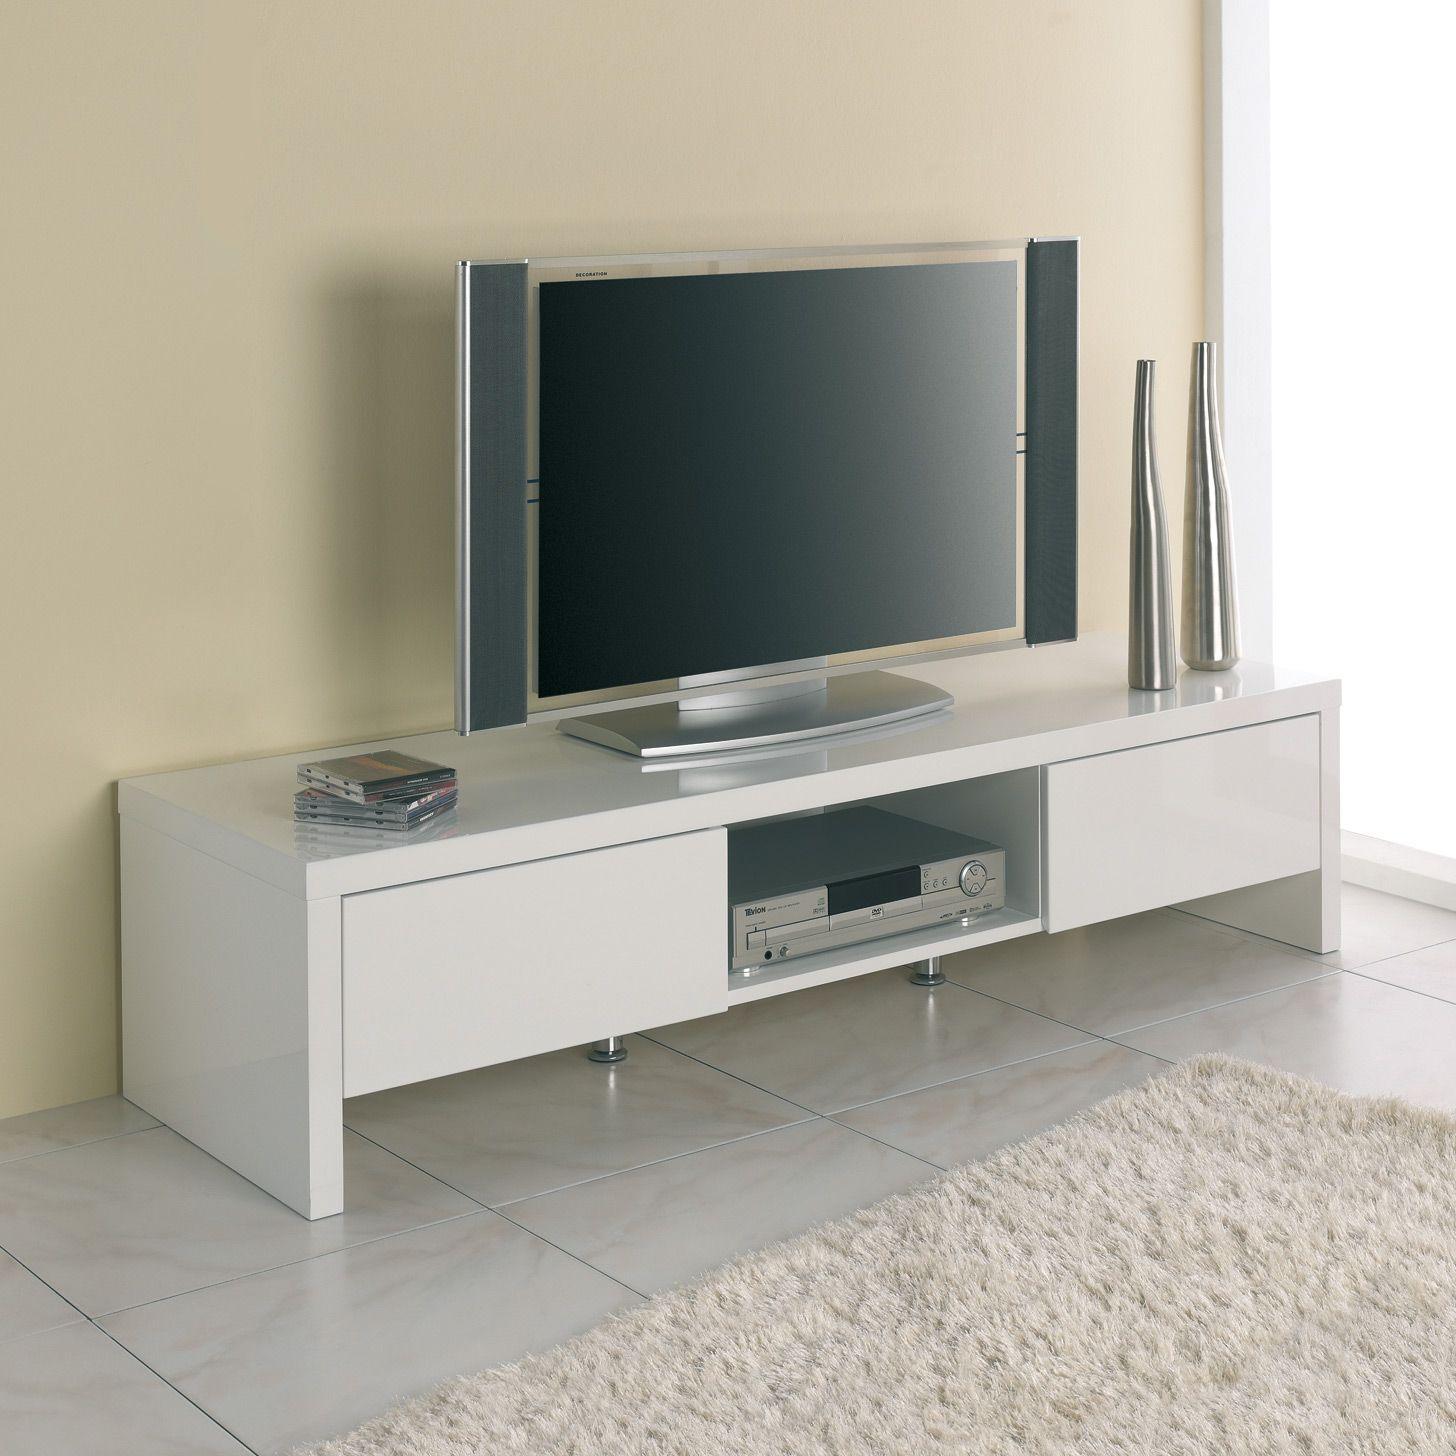 Meuble Tv 2 Tiroirs 1 Niche Longueur 160 X Hauteur 38cm Mdf Blanc